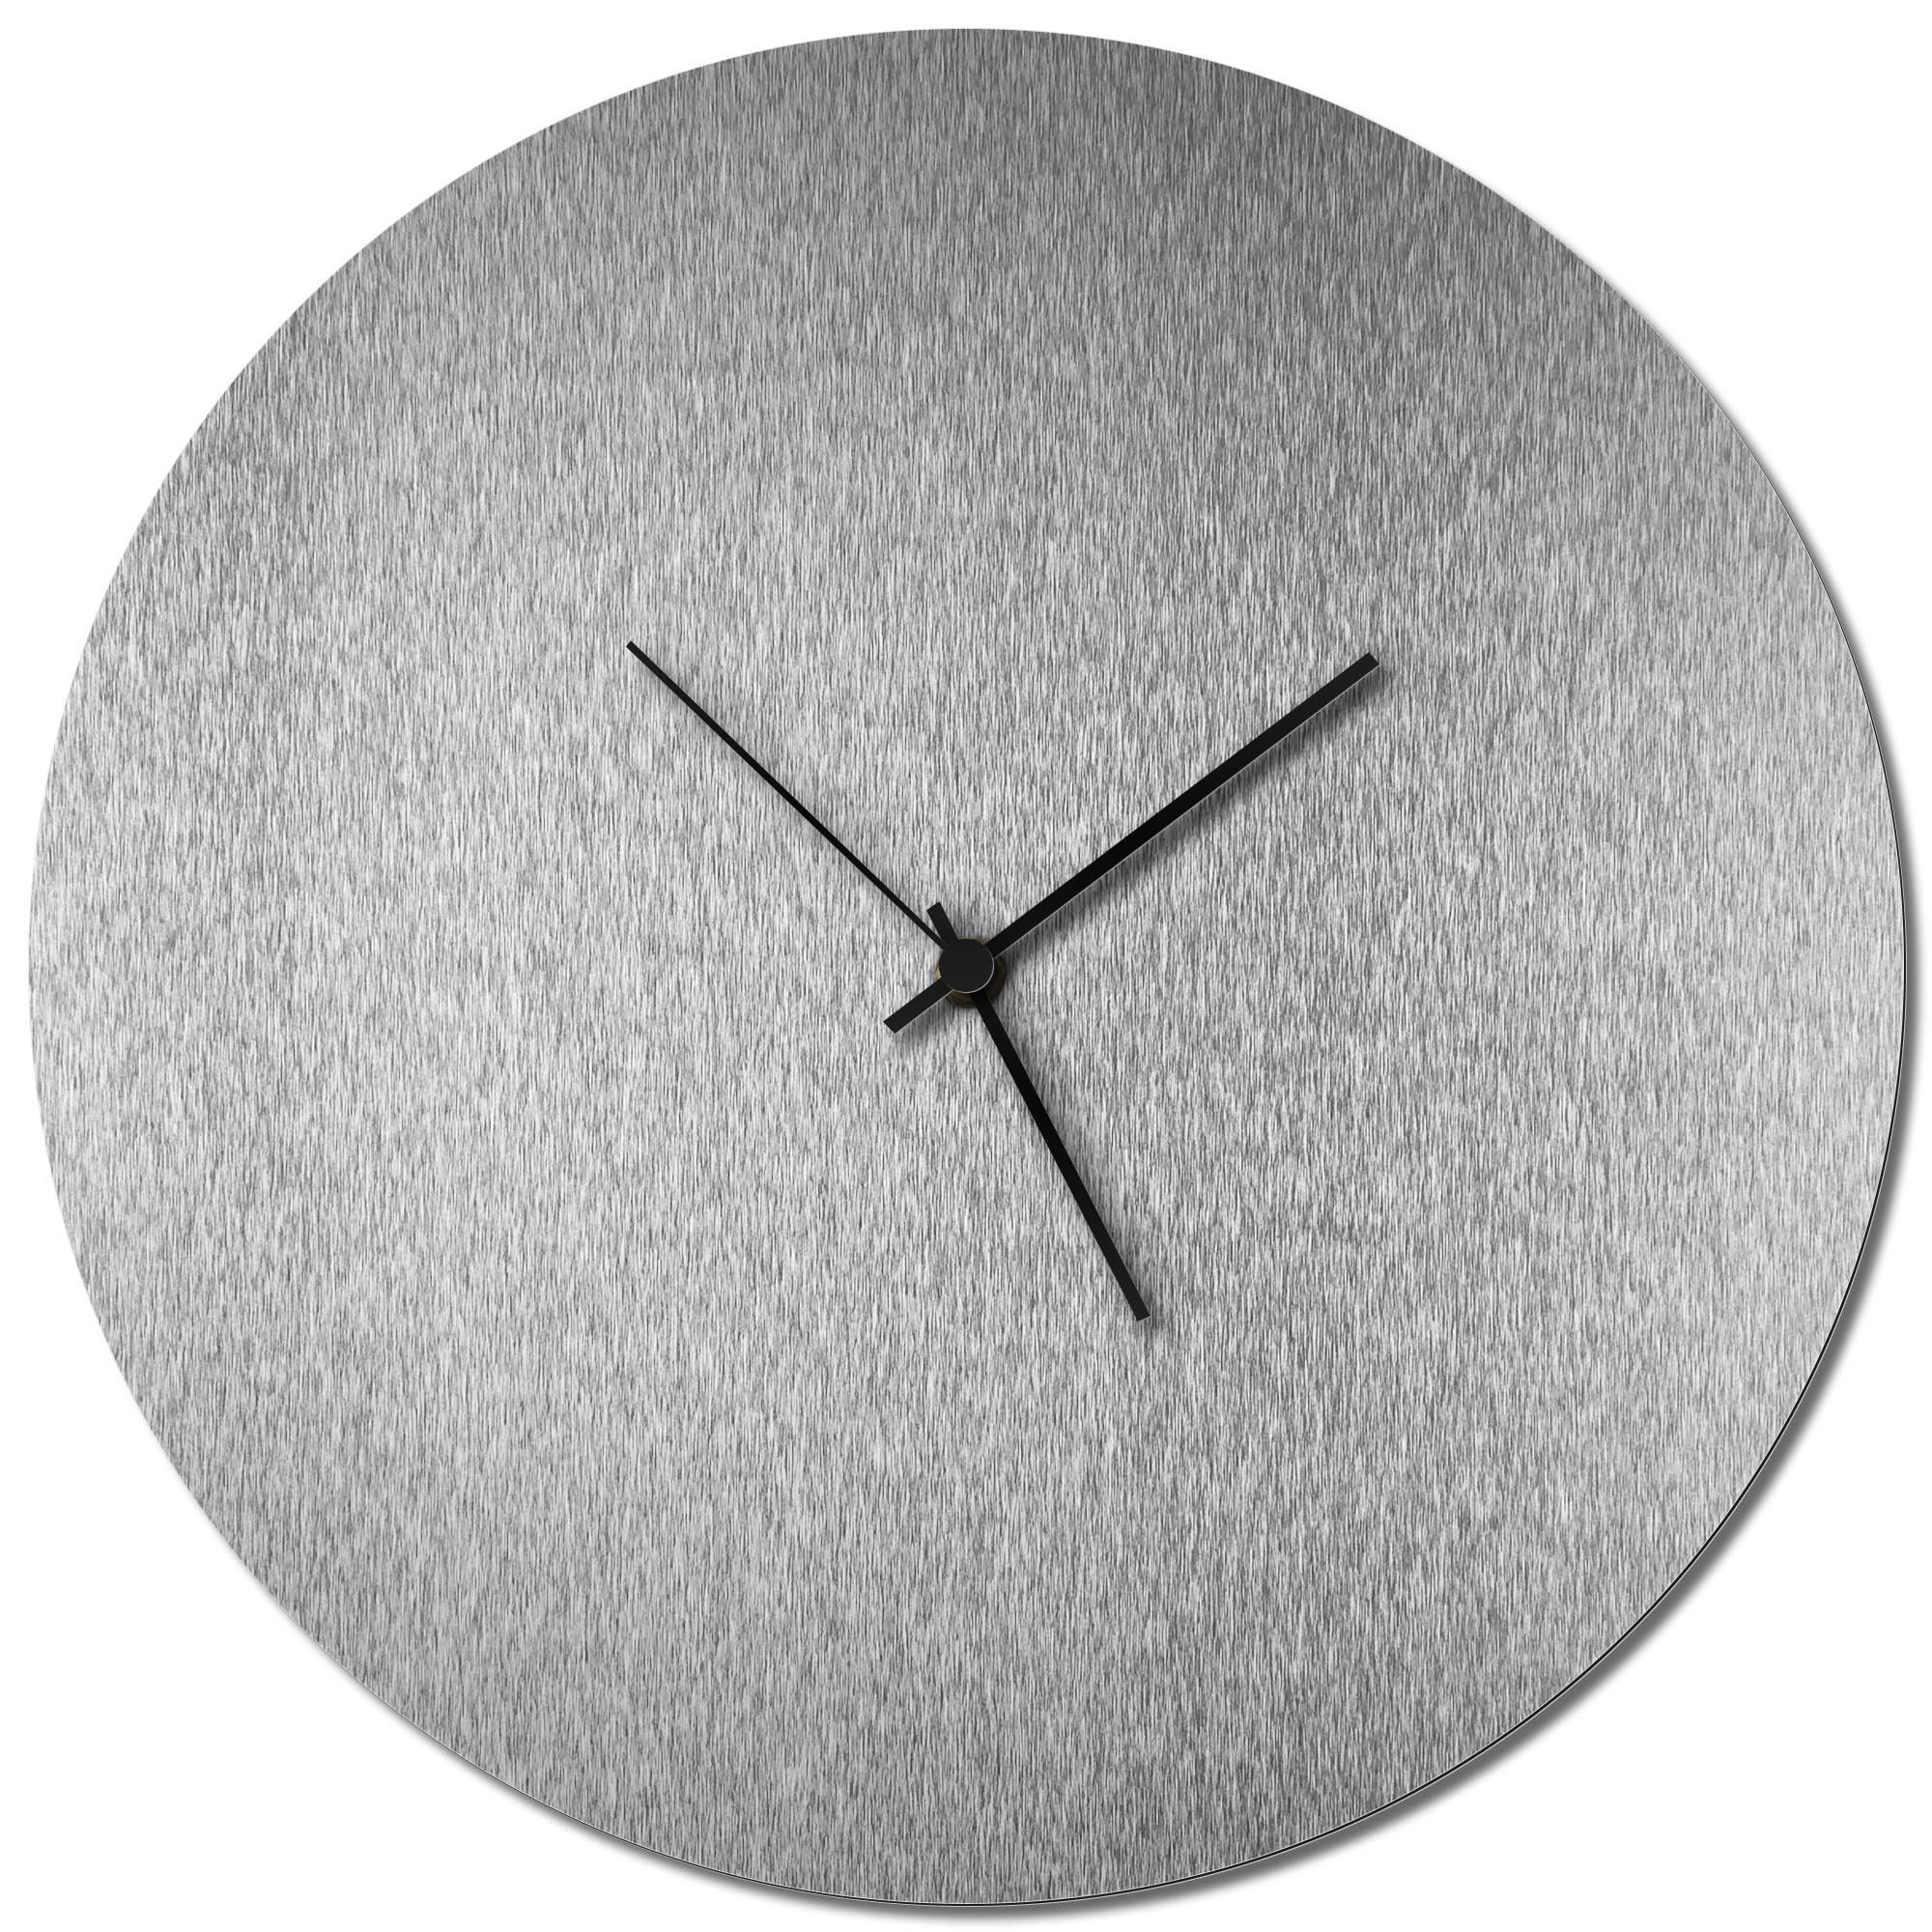 Adam Schwoeppe 'Silversmith Circle Clock Black' Midcentury Modern Style Wall Clock